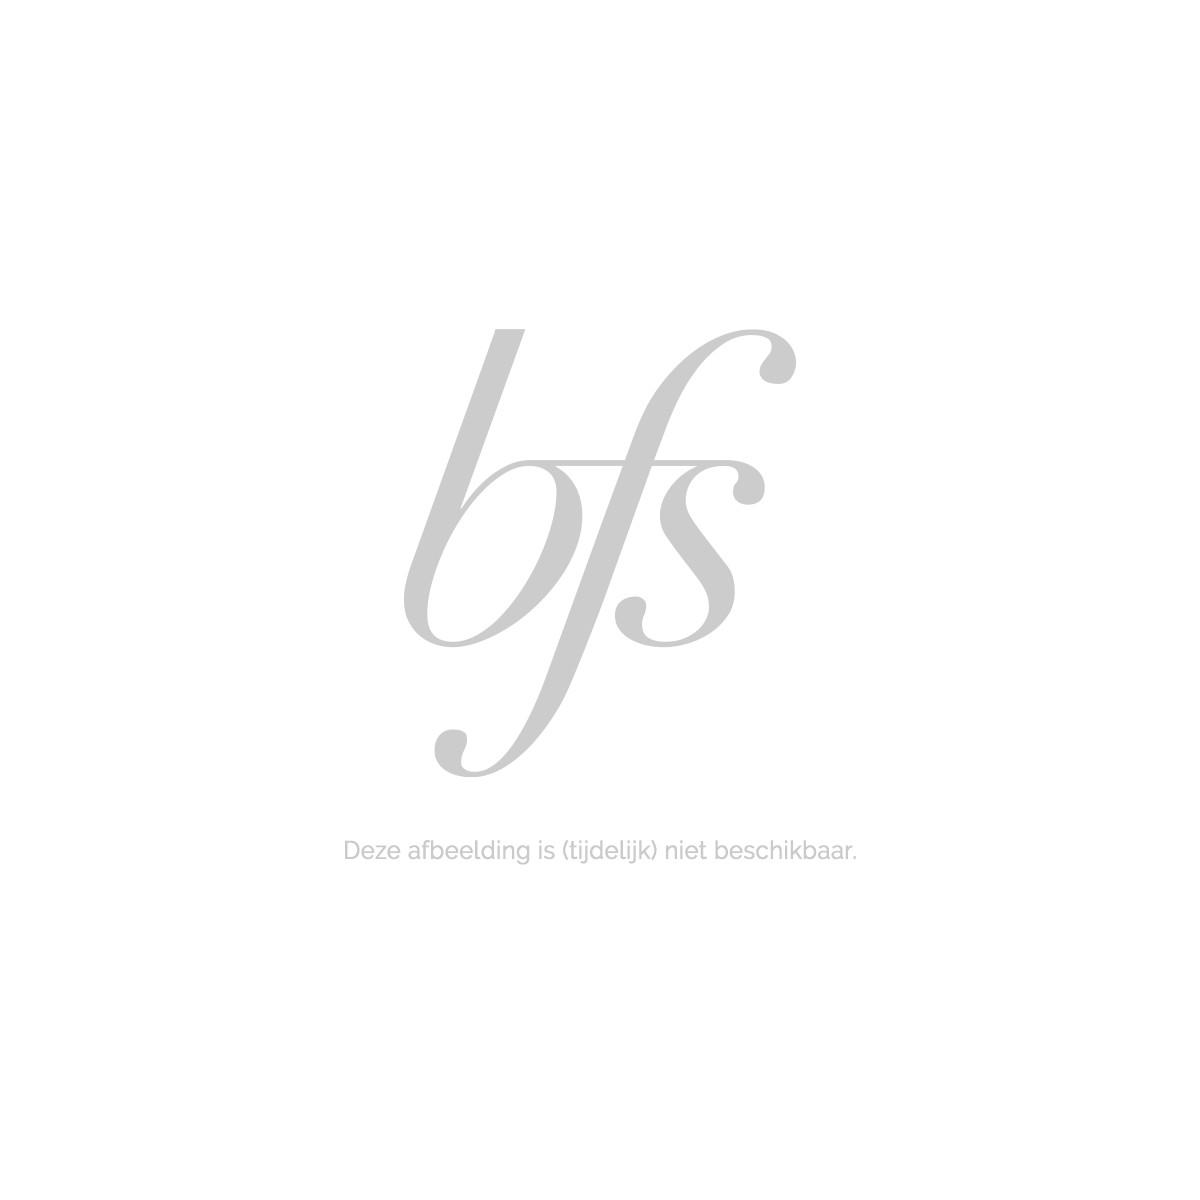 Marc Jacobs Daisy giftset Eau de Toilette 200 ml